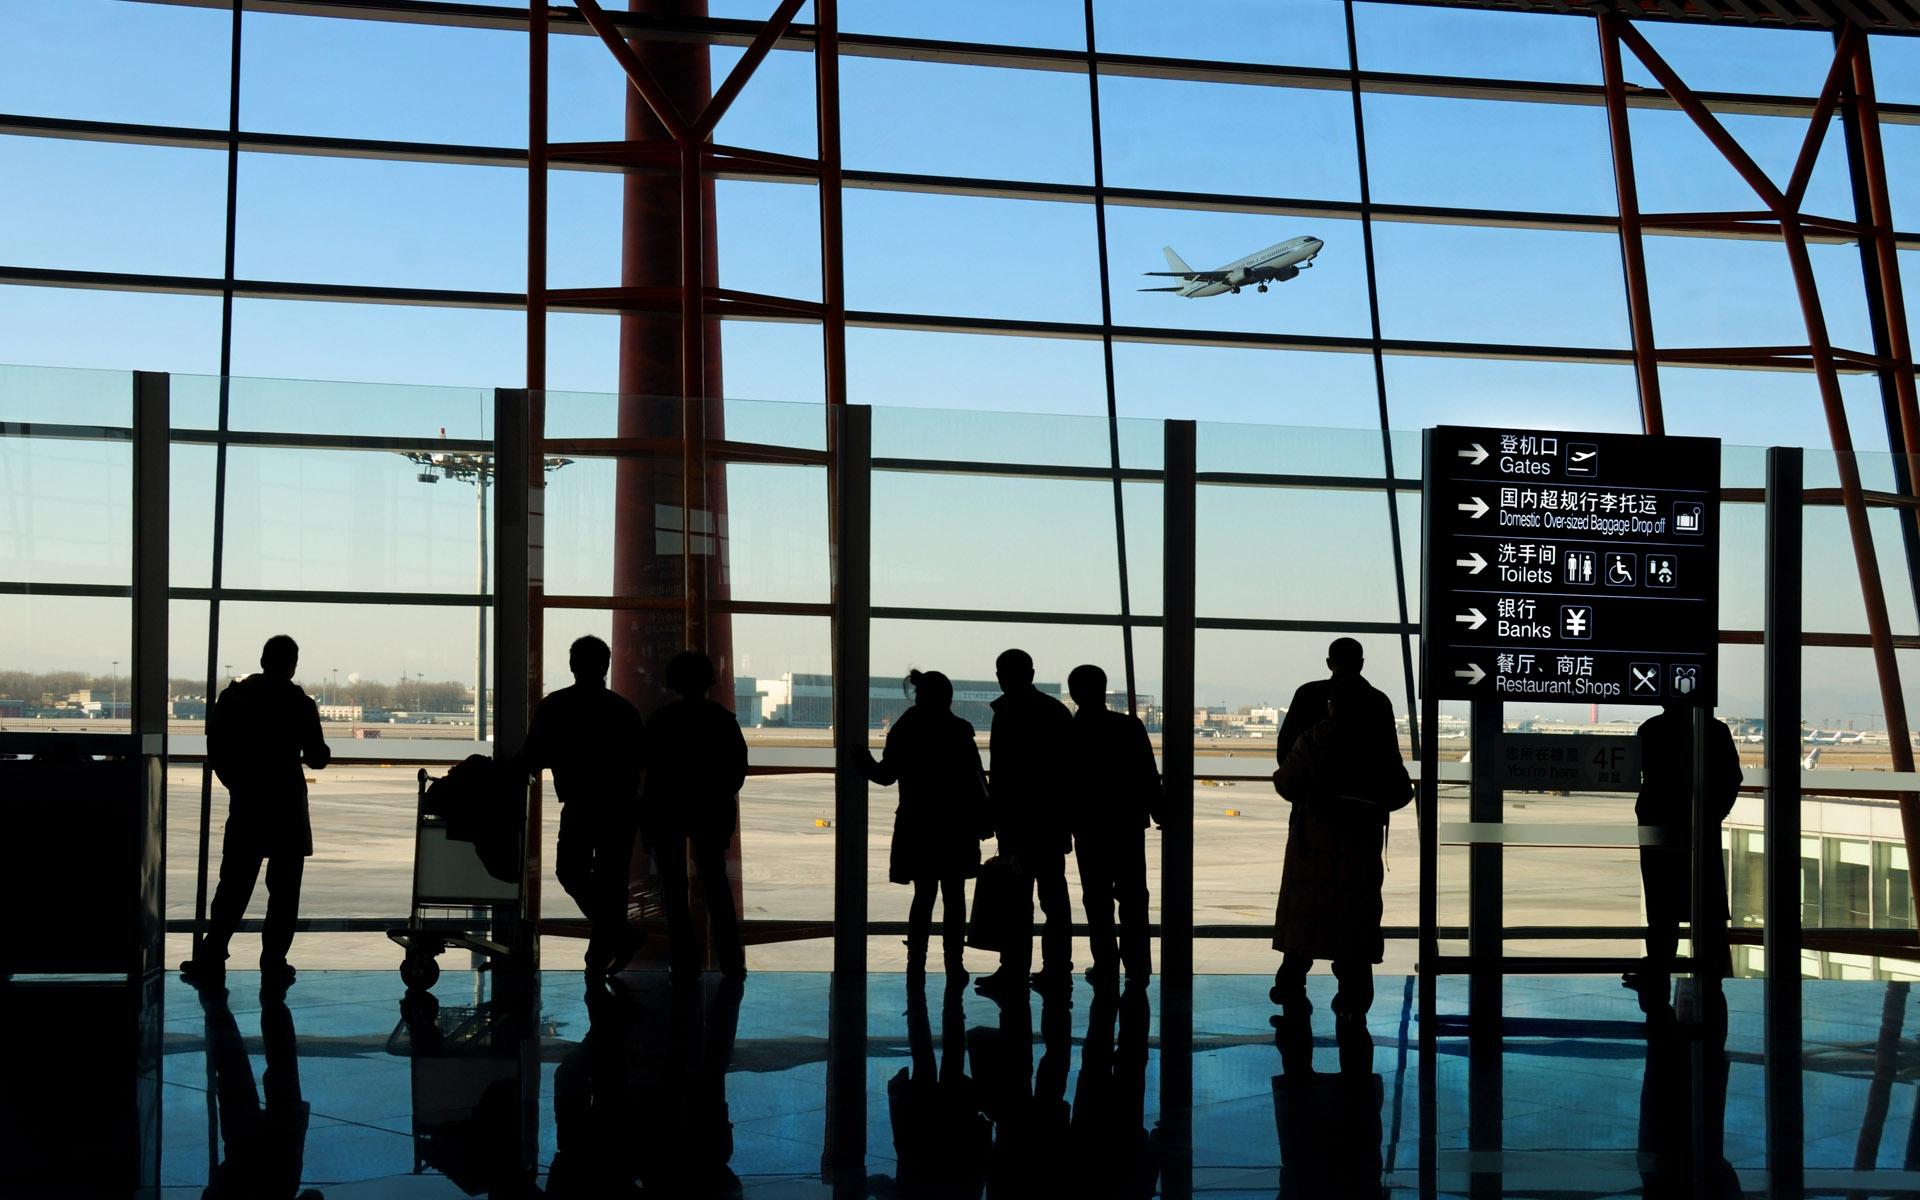 Зал ожидания в аэропорту картинки